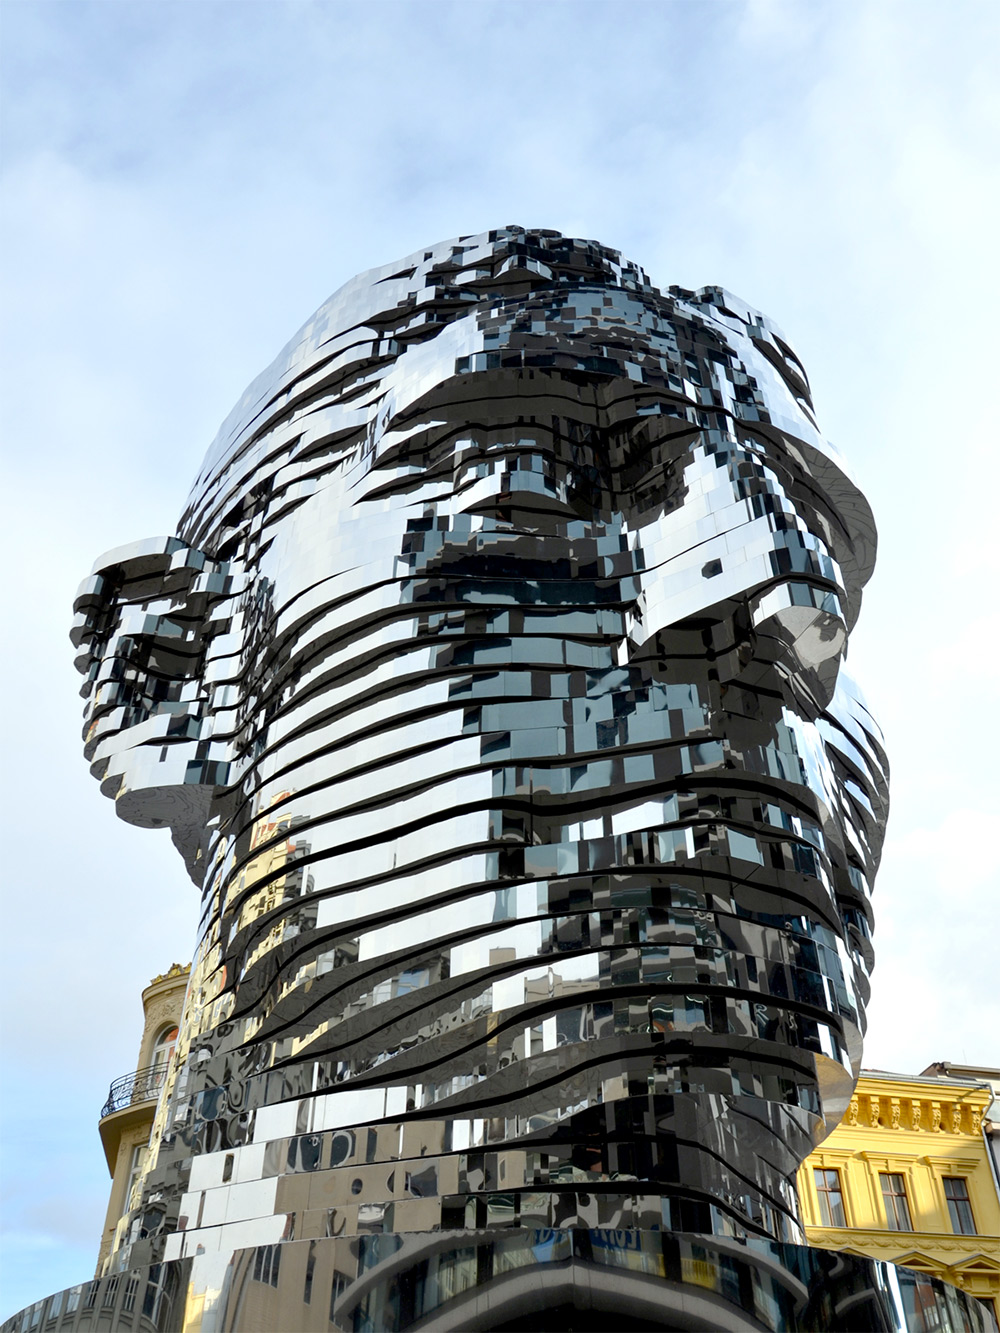 scultura-testa-kafka-rotante-praga-david-cerny-4